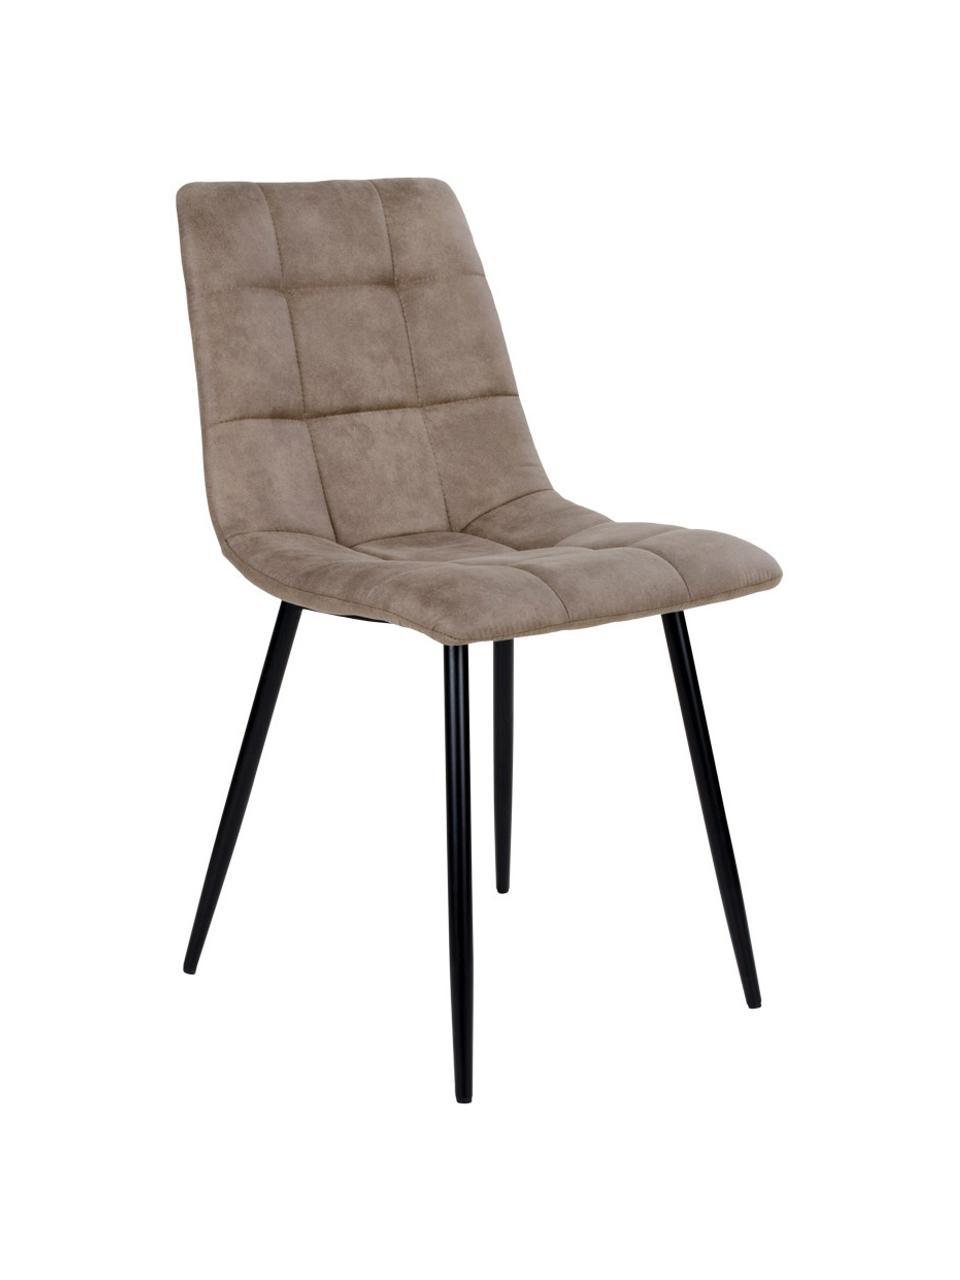 Sedia imbottita in microfibra Middleton, Rivestimento: microfibra, Gambe: metallo rivestito, Marrone chiaro, nero, Larg. 44 x Alt. 55 cm